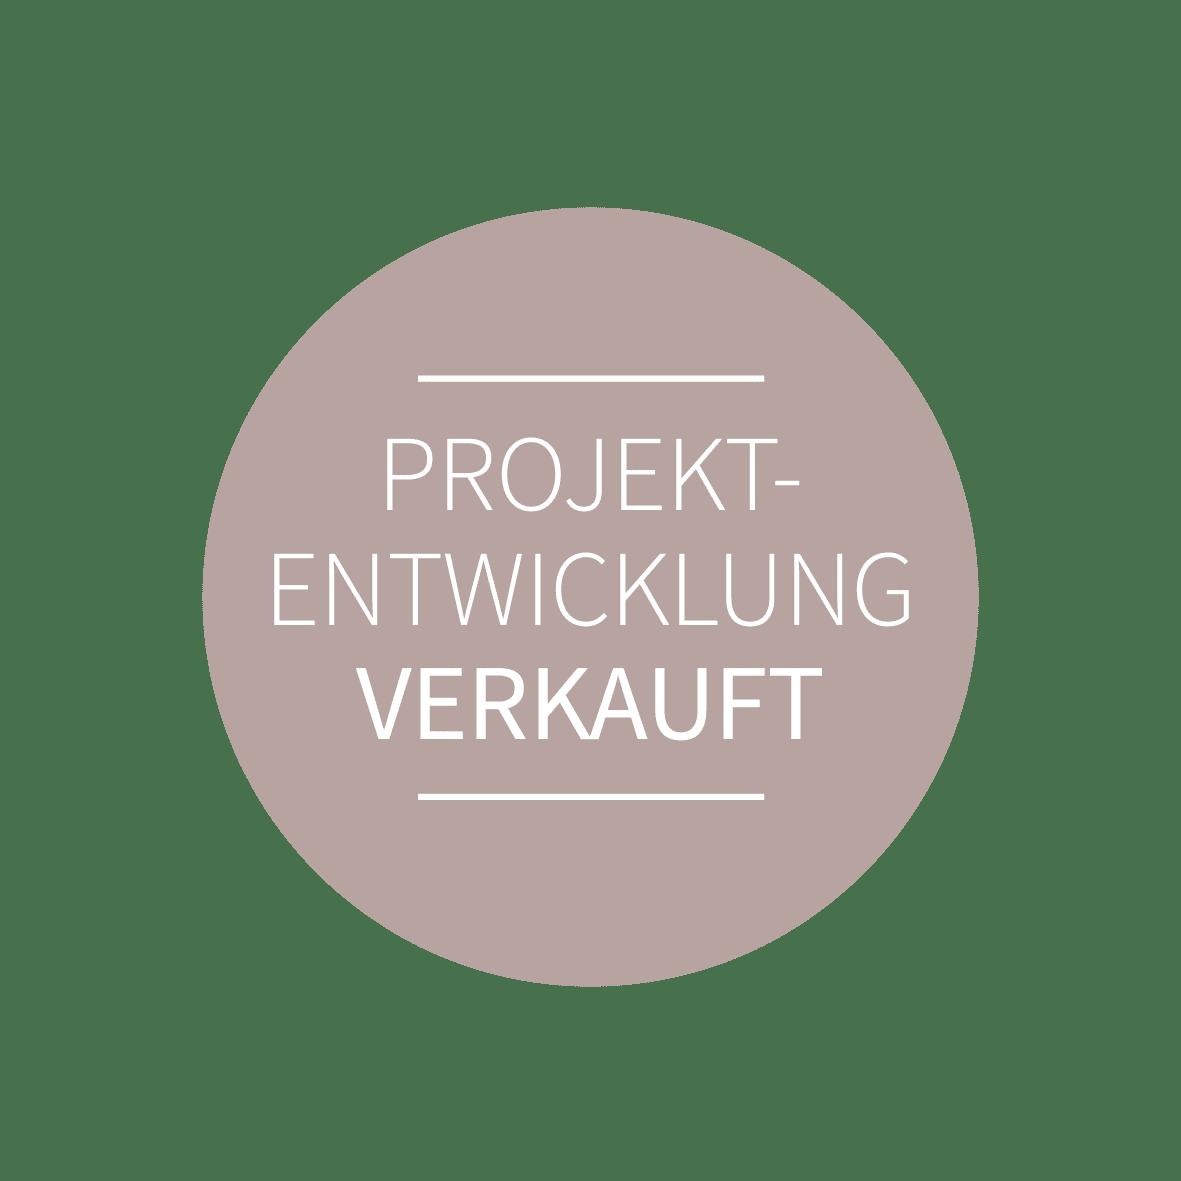 button projektentwicklung verkauft